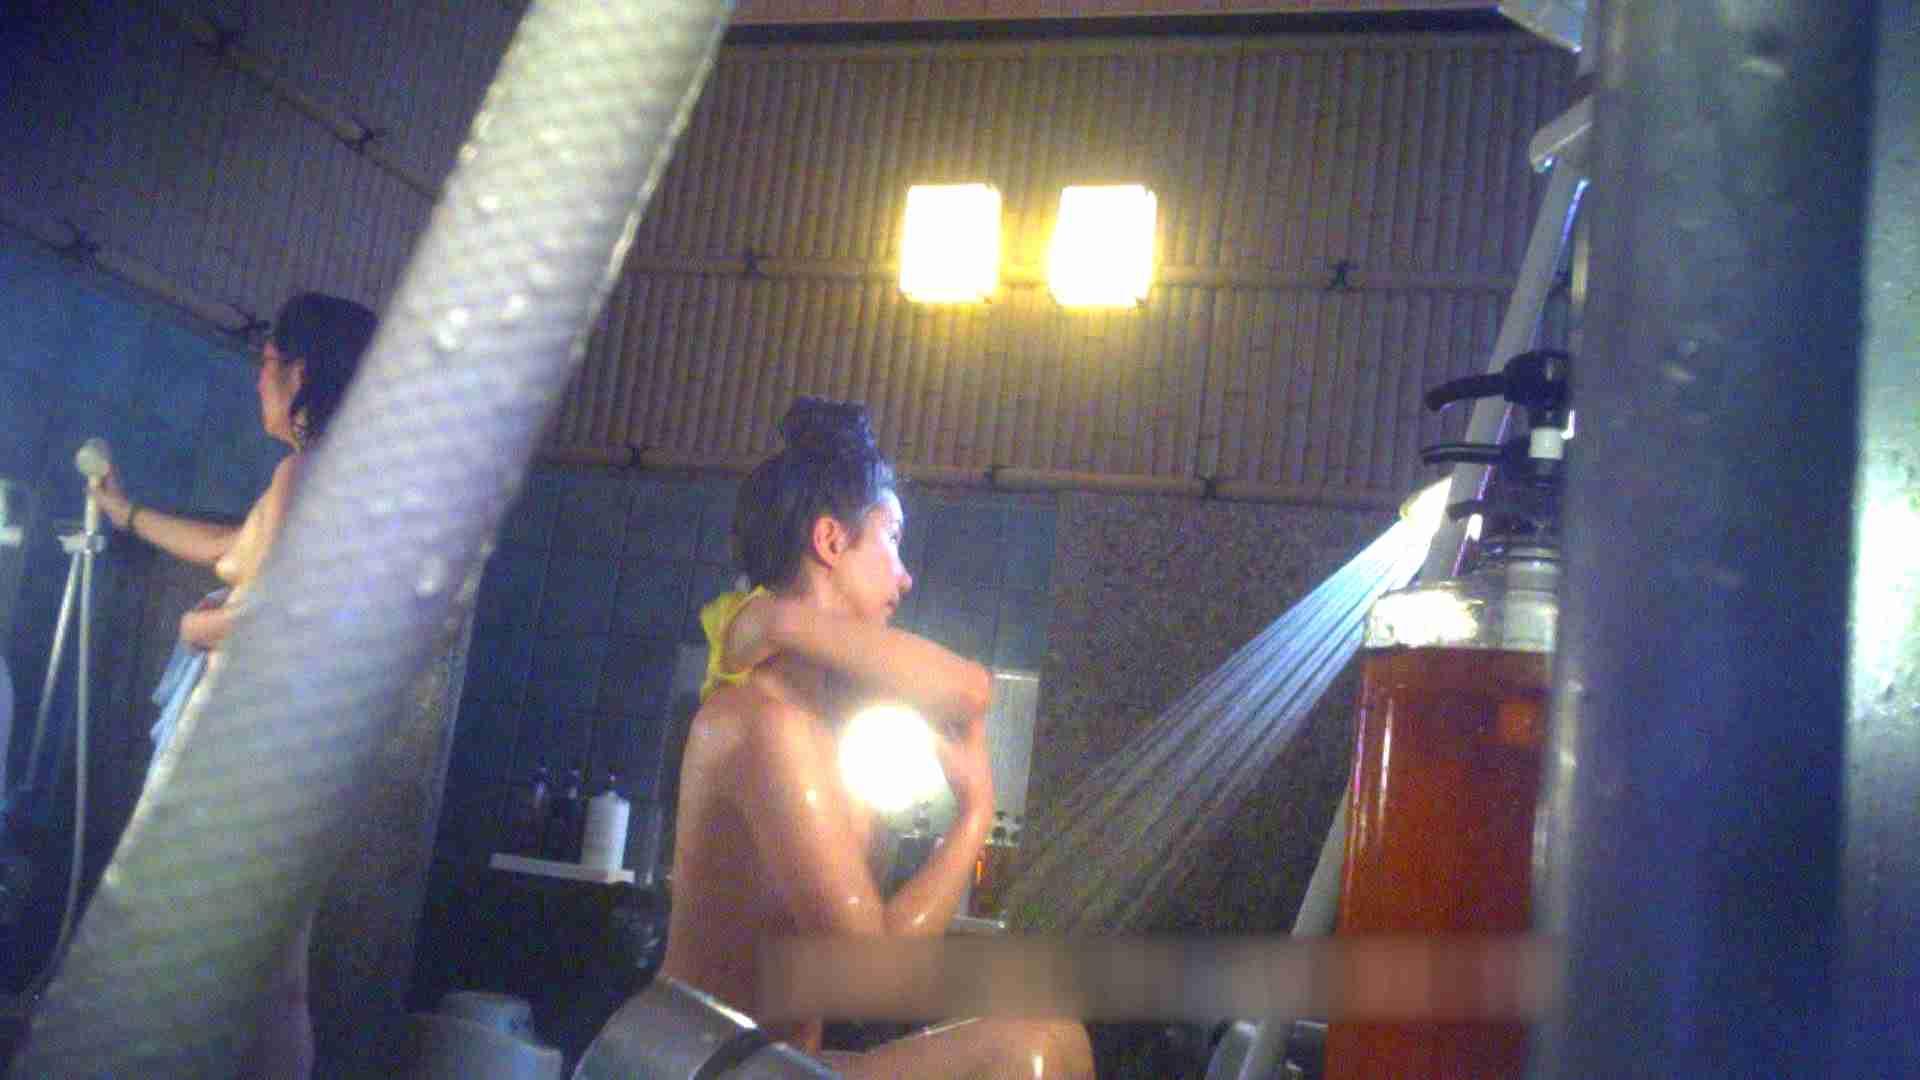 TG.15 【上等兵】高級旅館の爆乳女将で有名っぽい 爆乳 えろ無修正画像 110枚 83